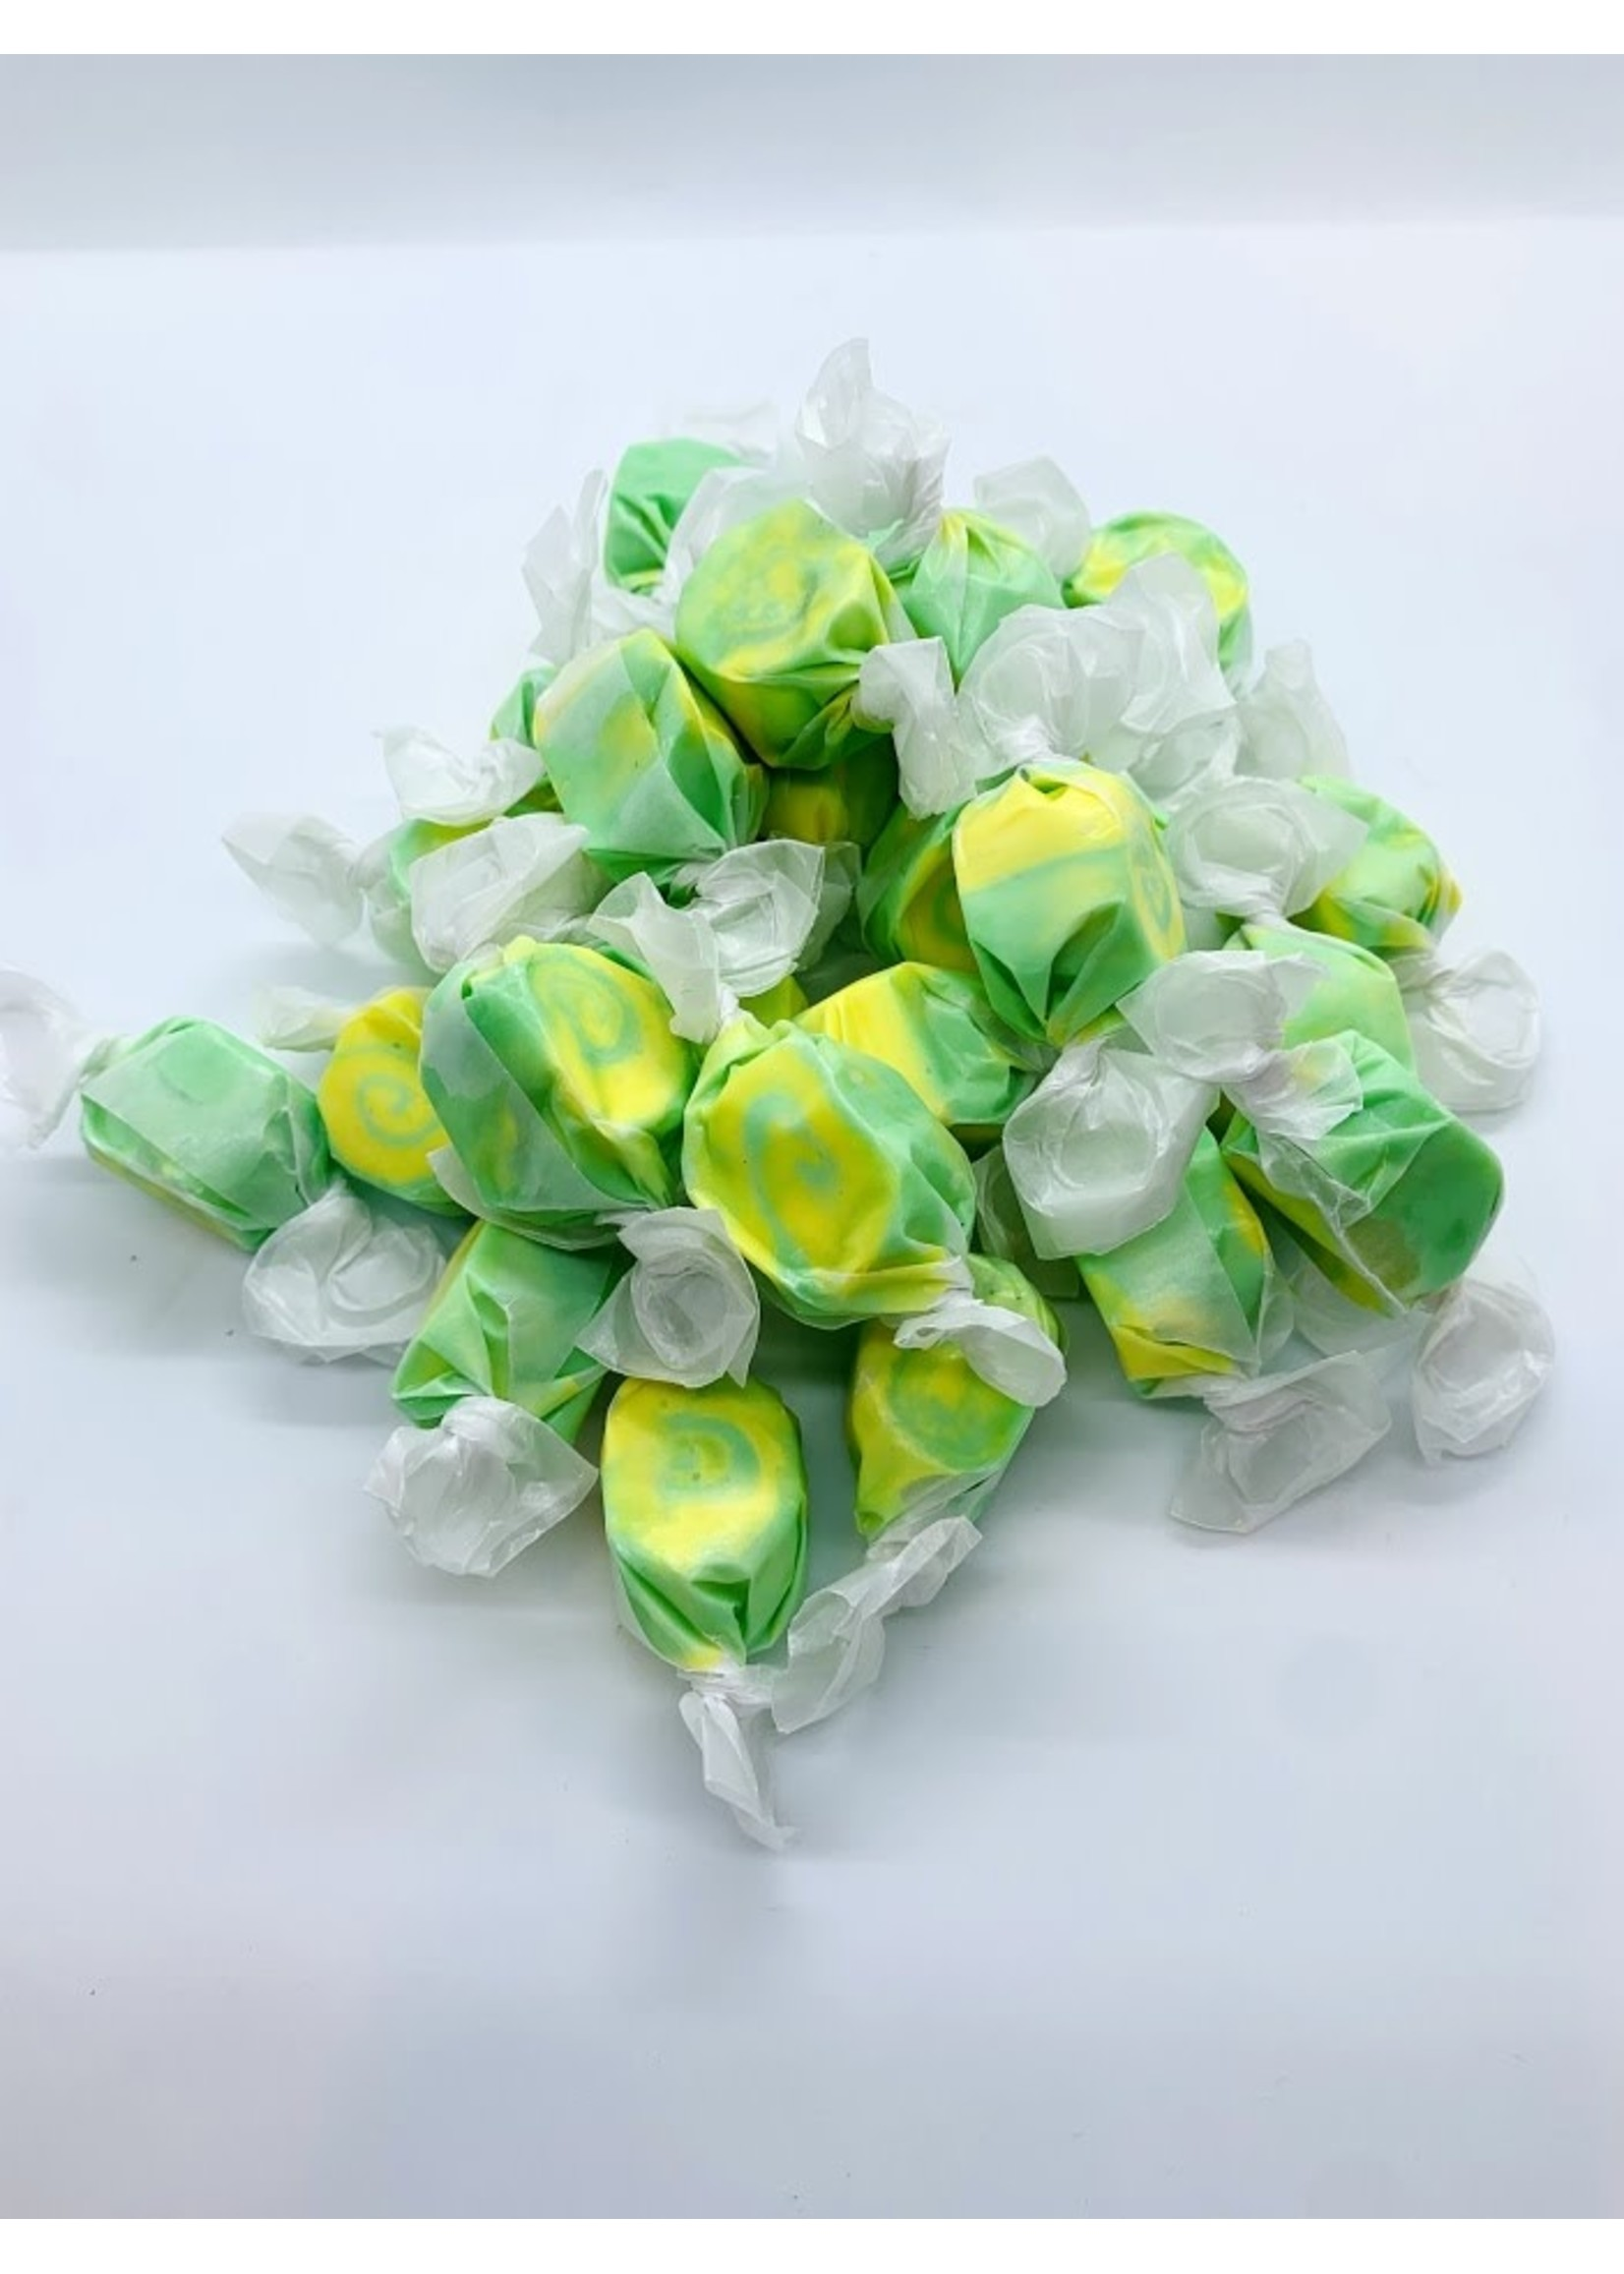 Kermit's Key Lime Taffy